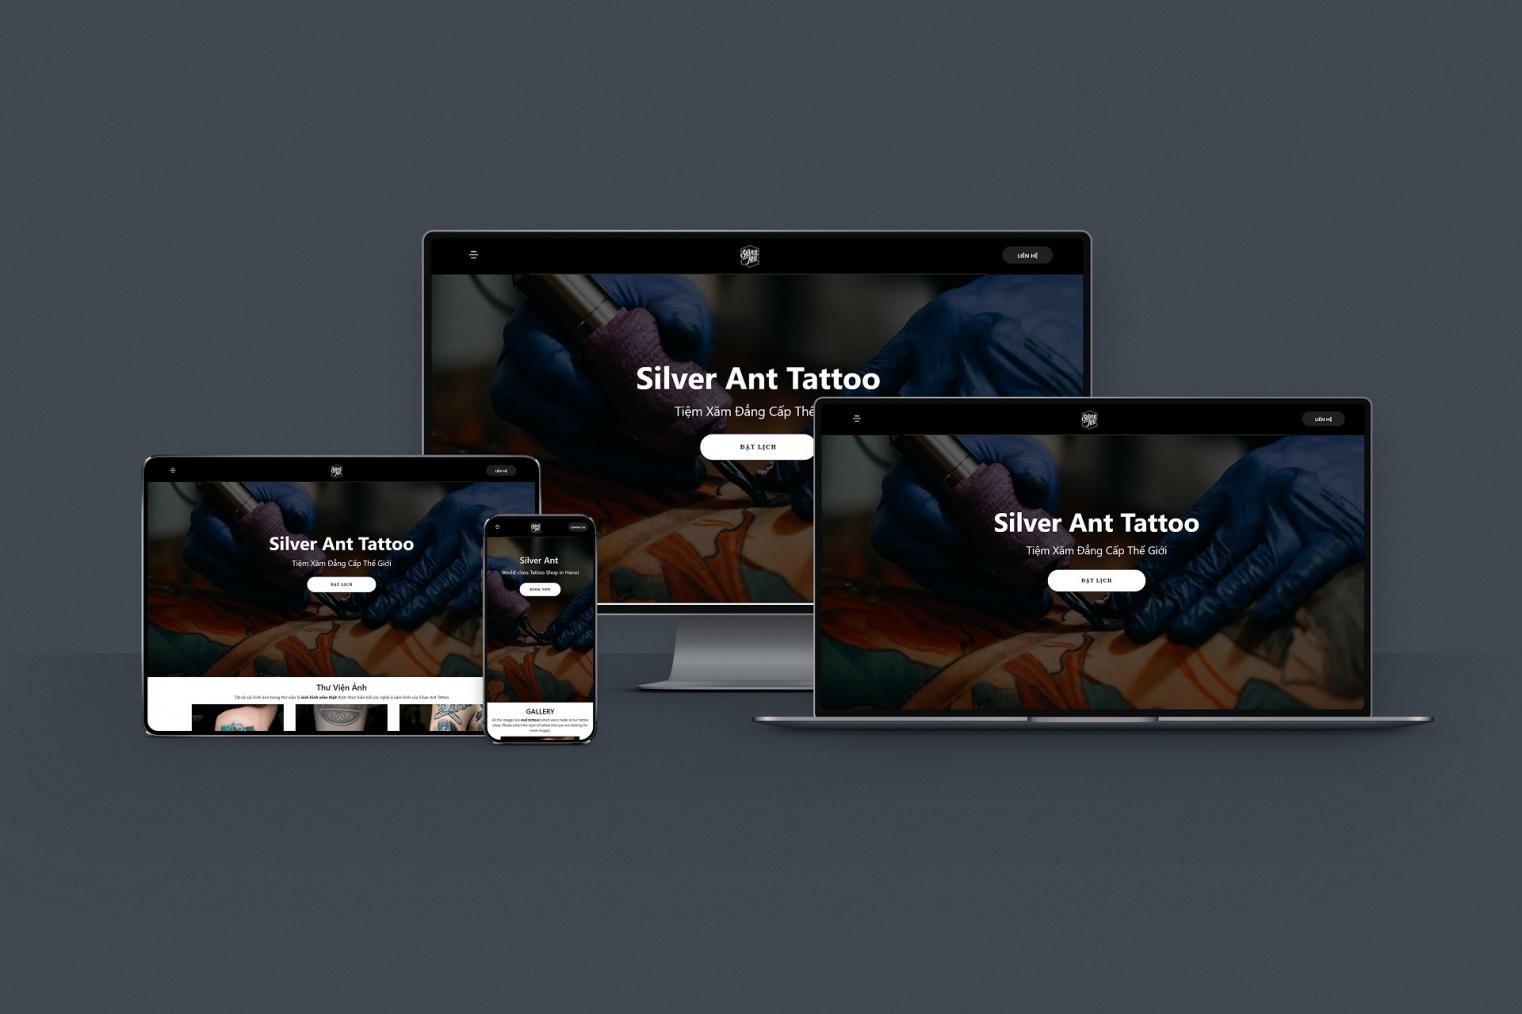 Thiết kế website Săm Studio - Silveranttattoo.com